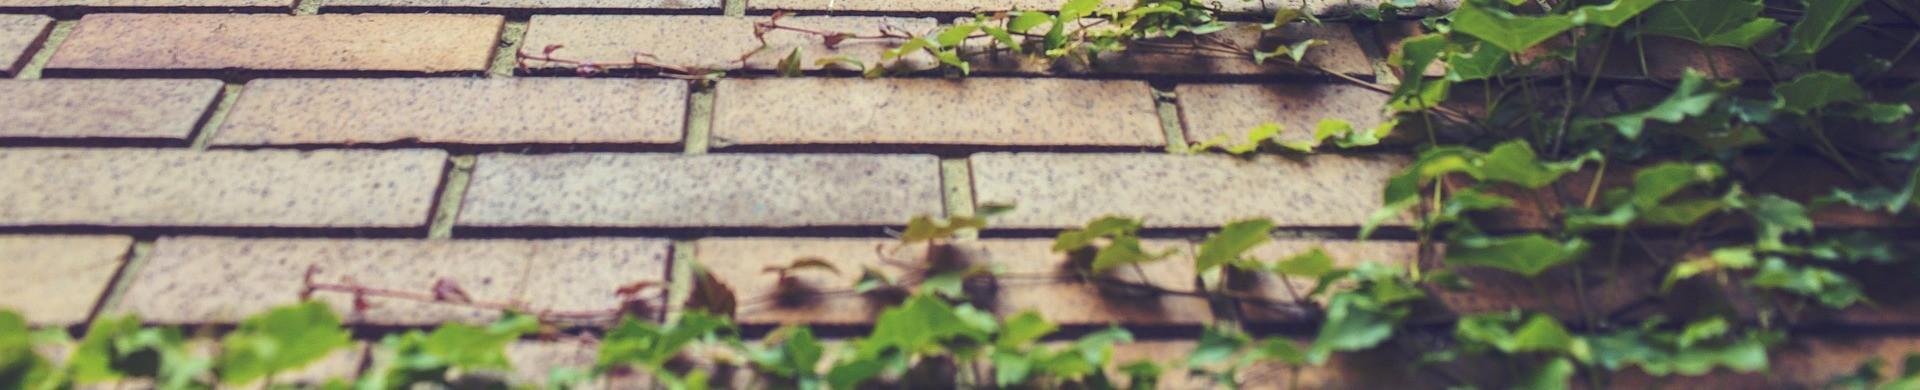 Plantas trepadoras - Comprar plantas trepadoras